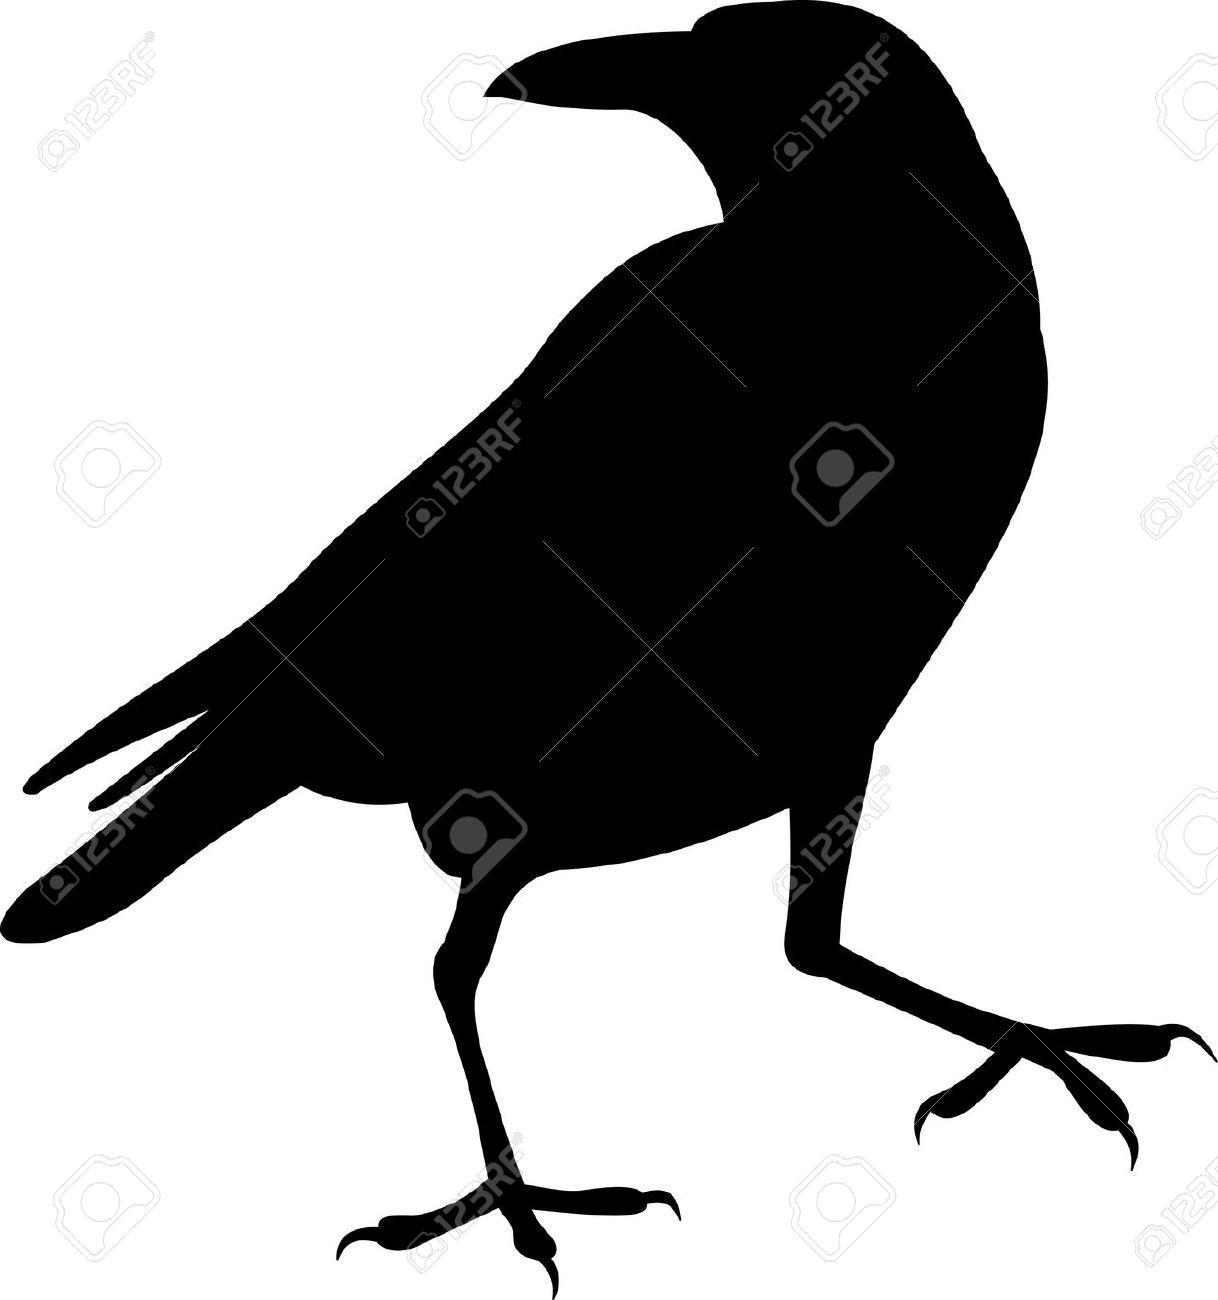 Flying Raven Crow Metal Wildlife Wall Yard Art Silhouette | Ravens ...